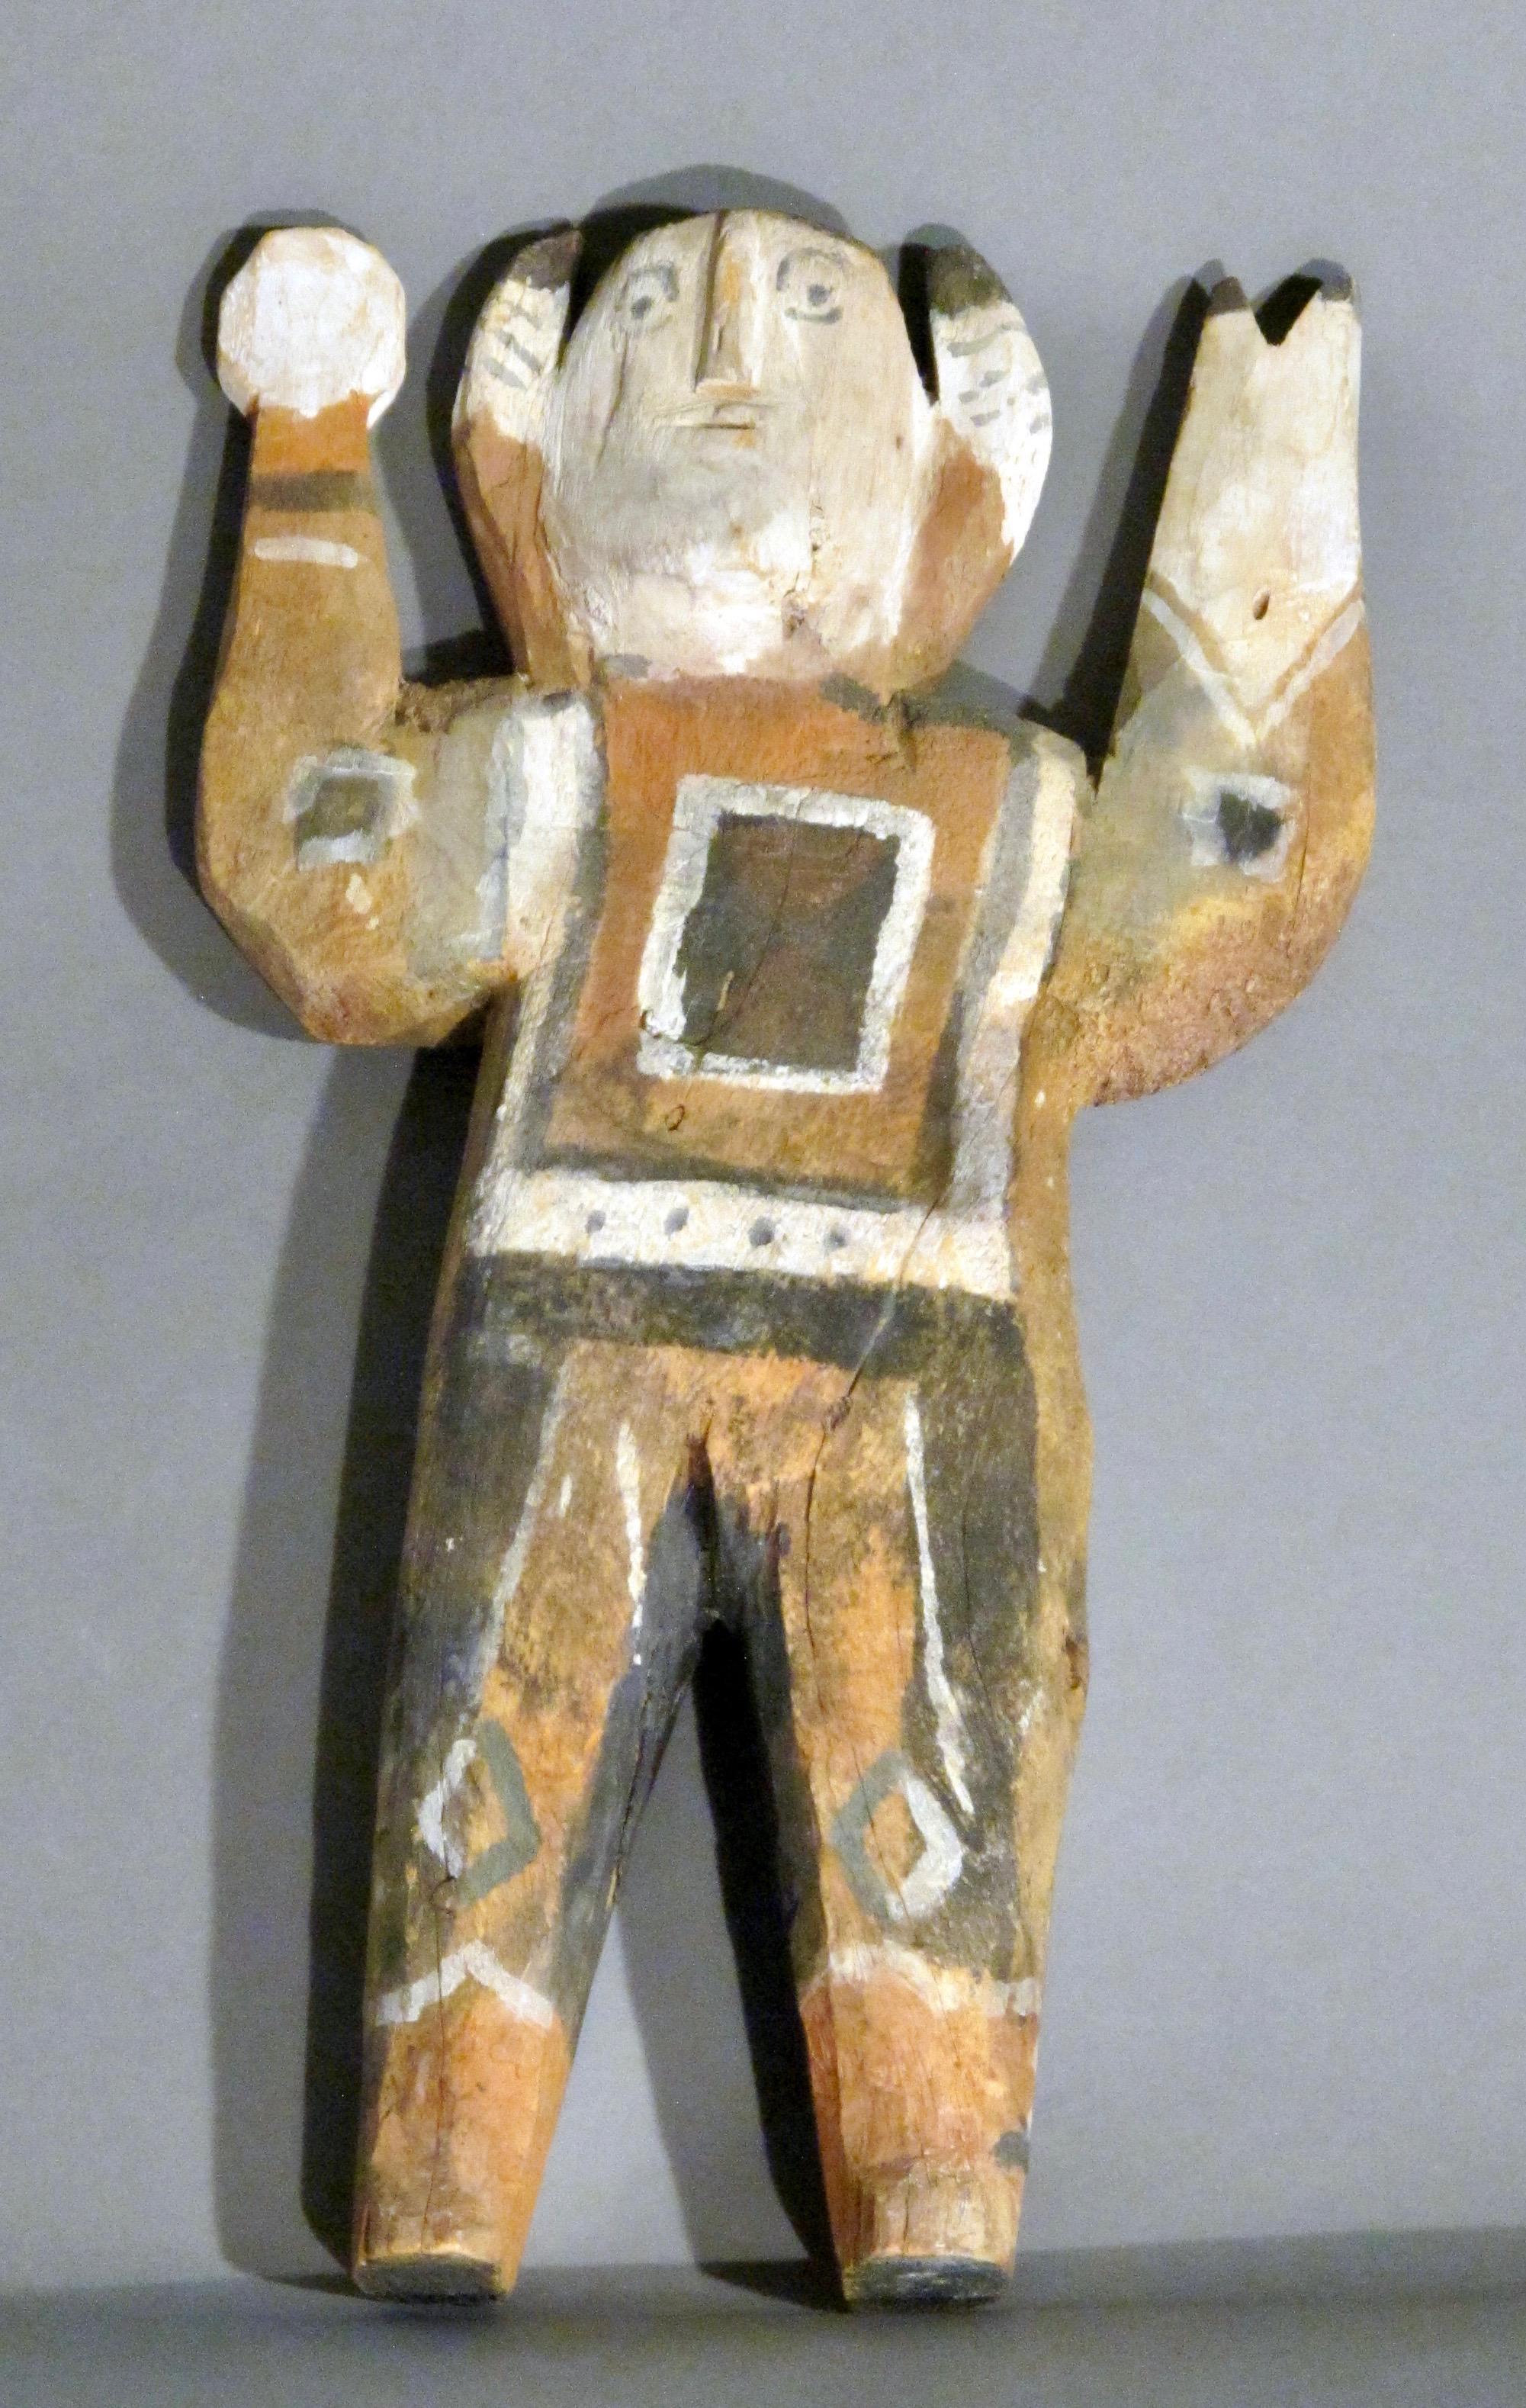 Untitled figure by Charlie Willeto, Navajo folk art, wood, paint, vintage